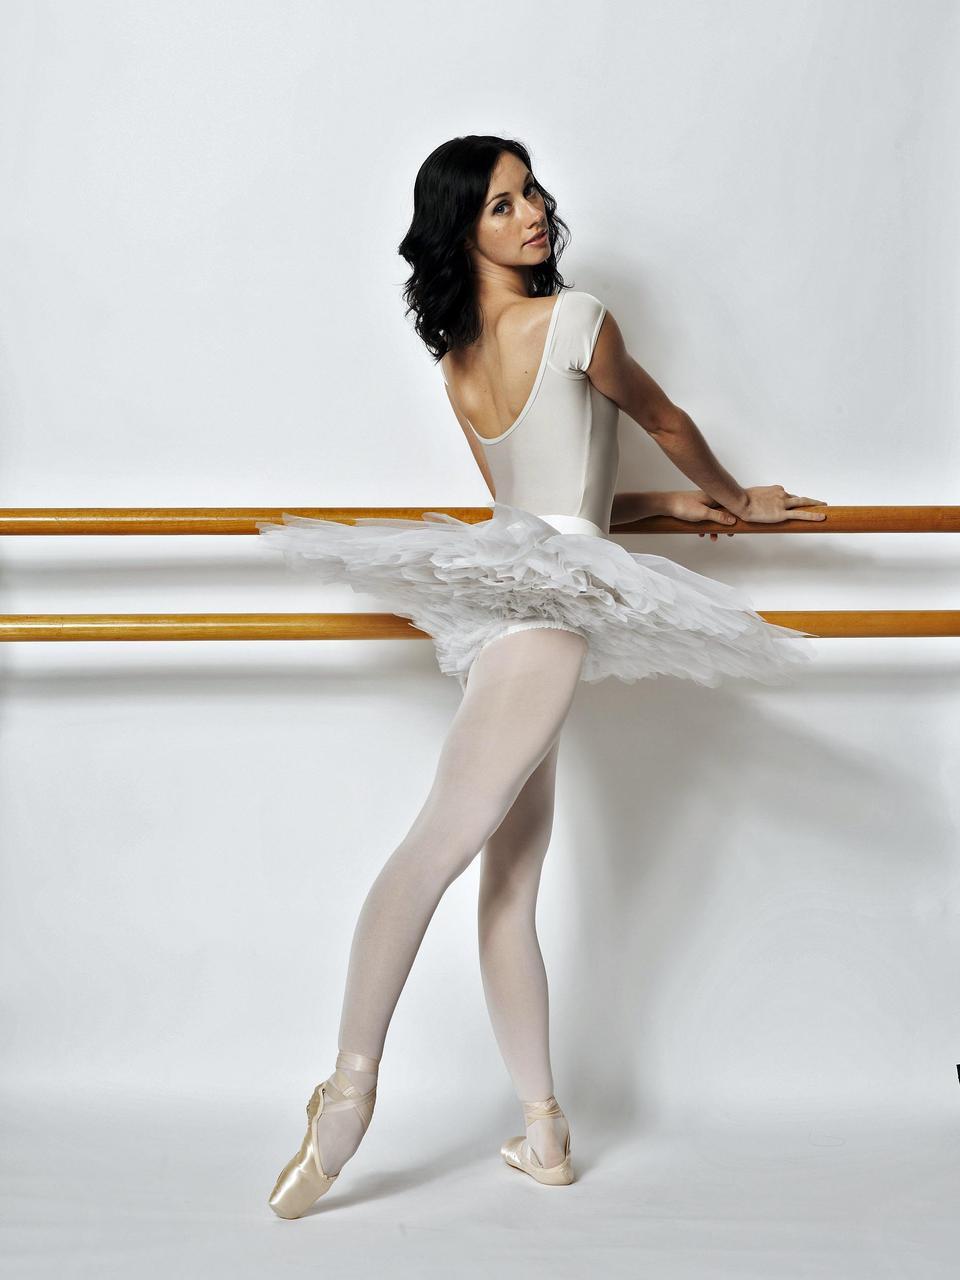 Фото балерин в зале 12 фотография